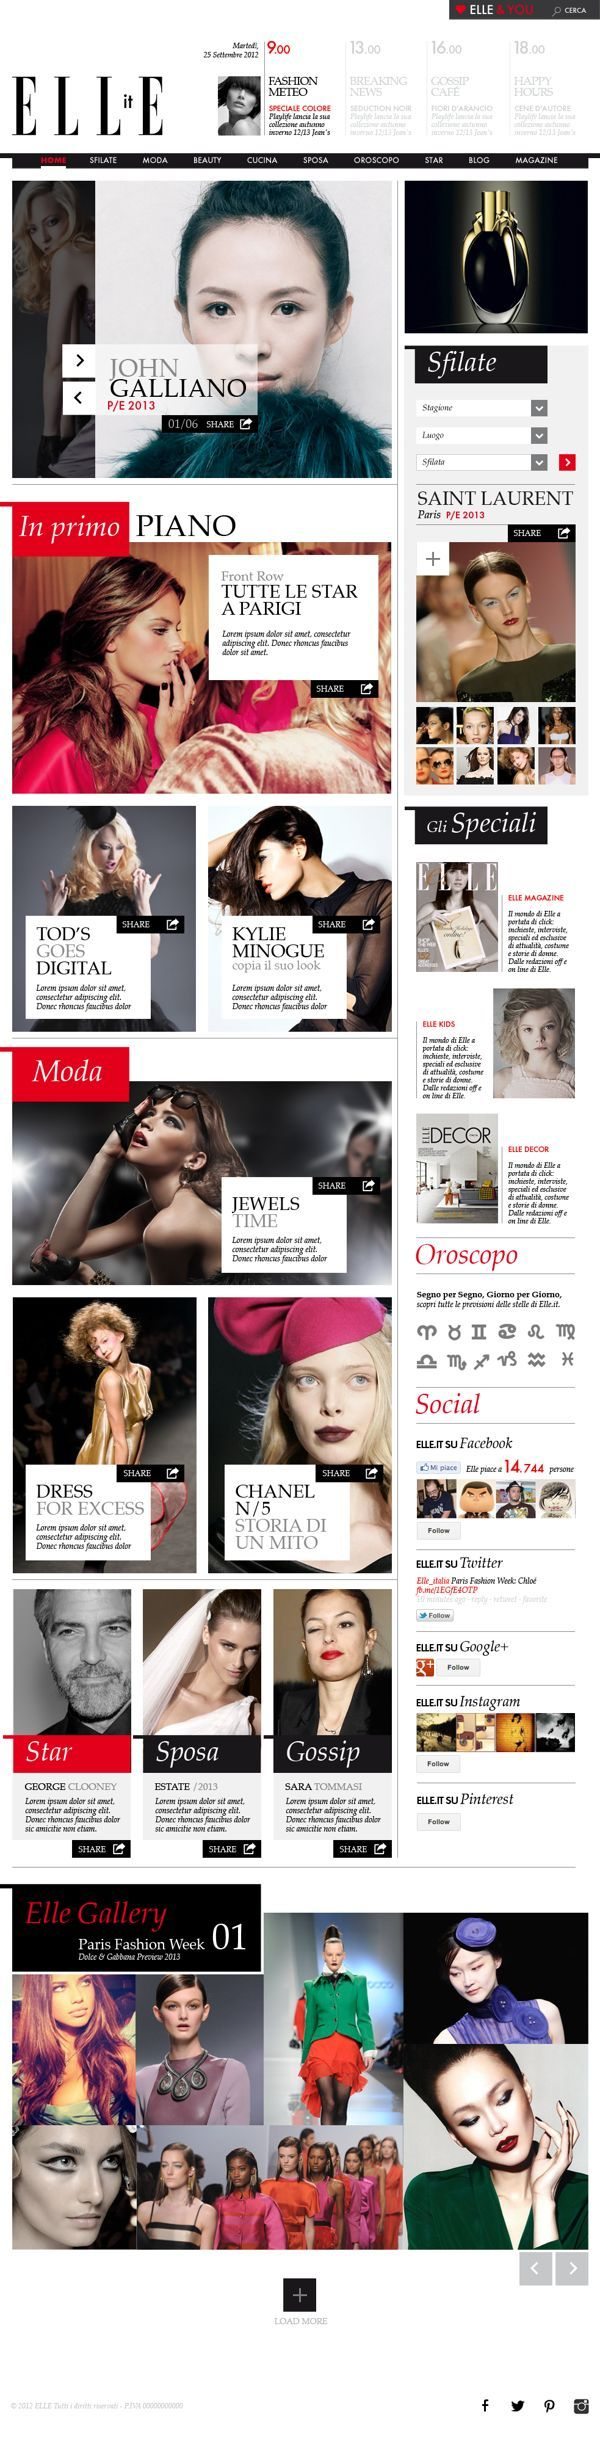 Elle it magazine